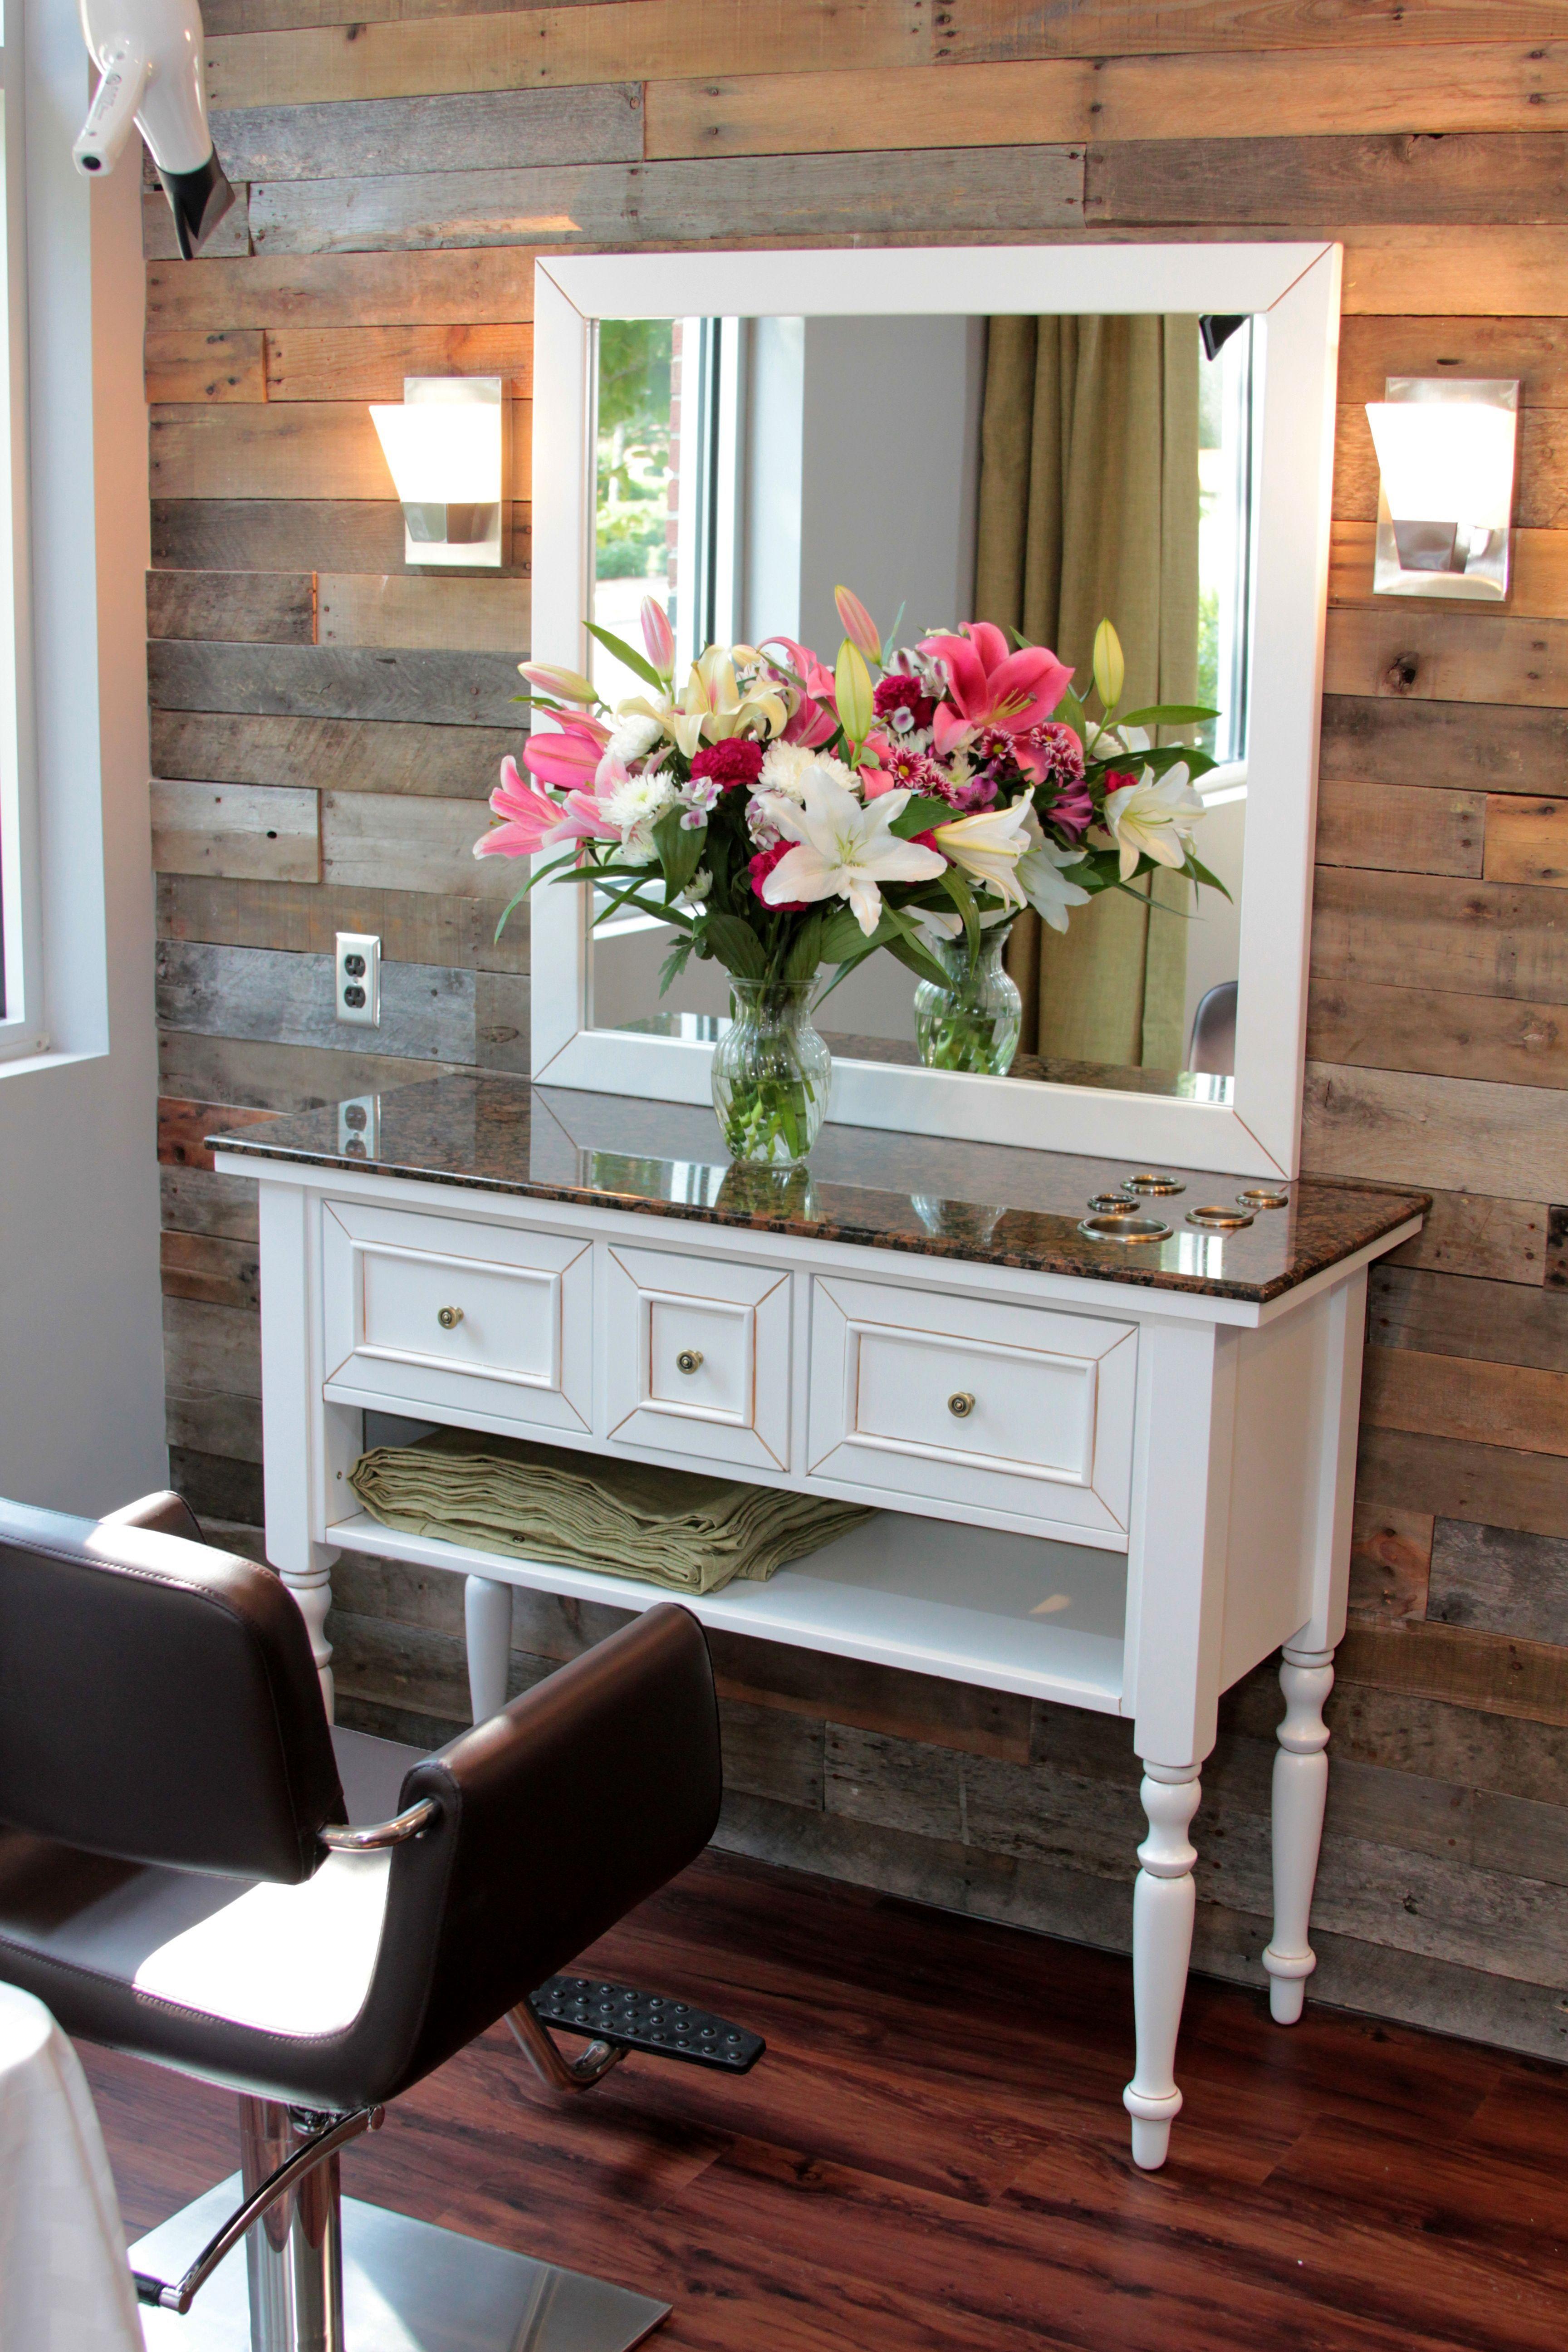 46+ Best Home Salon Decor Ideas For Private Salon On Your